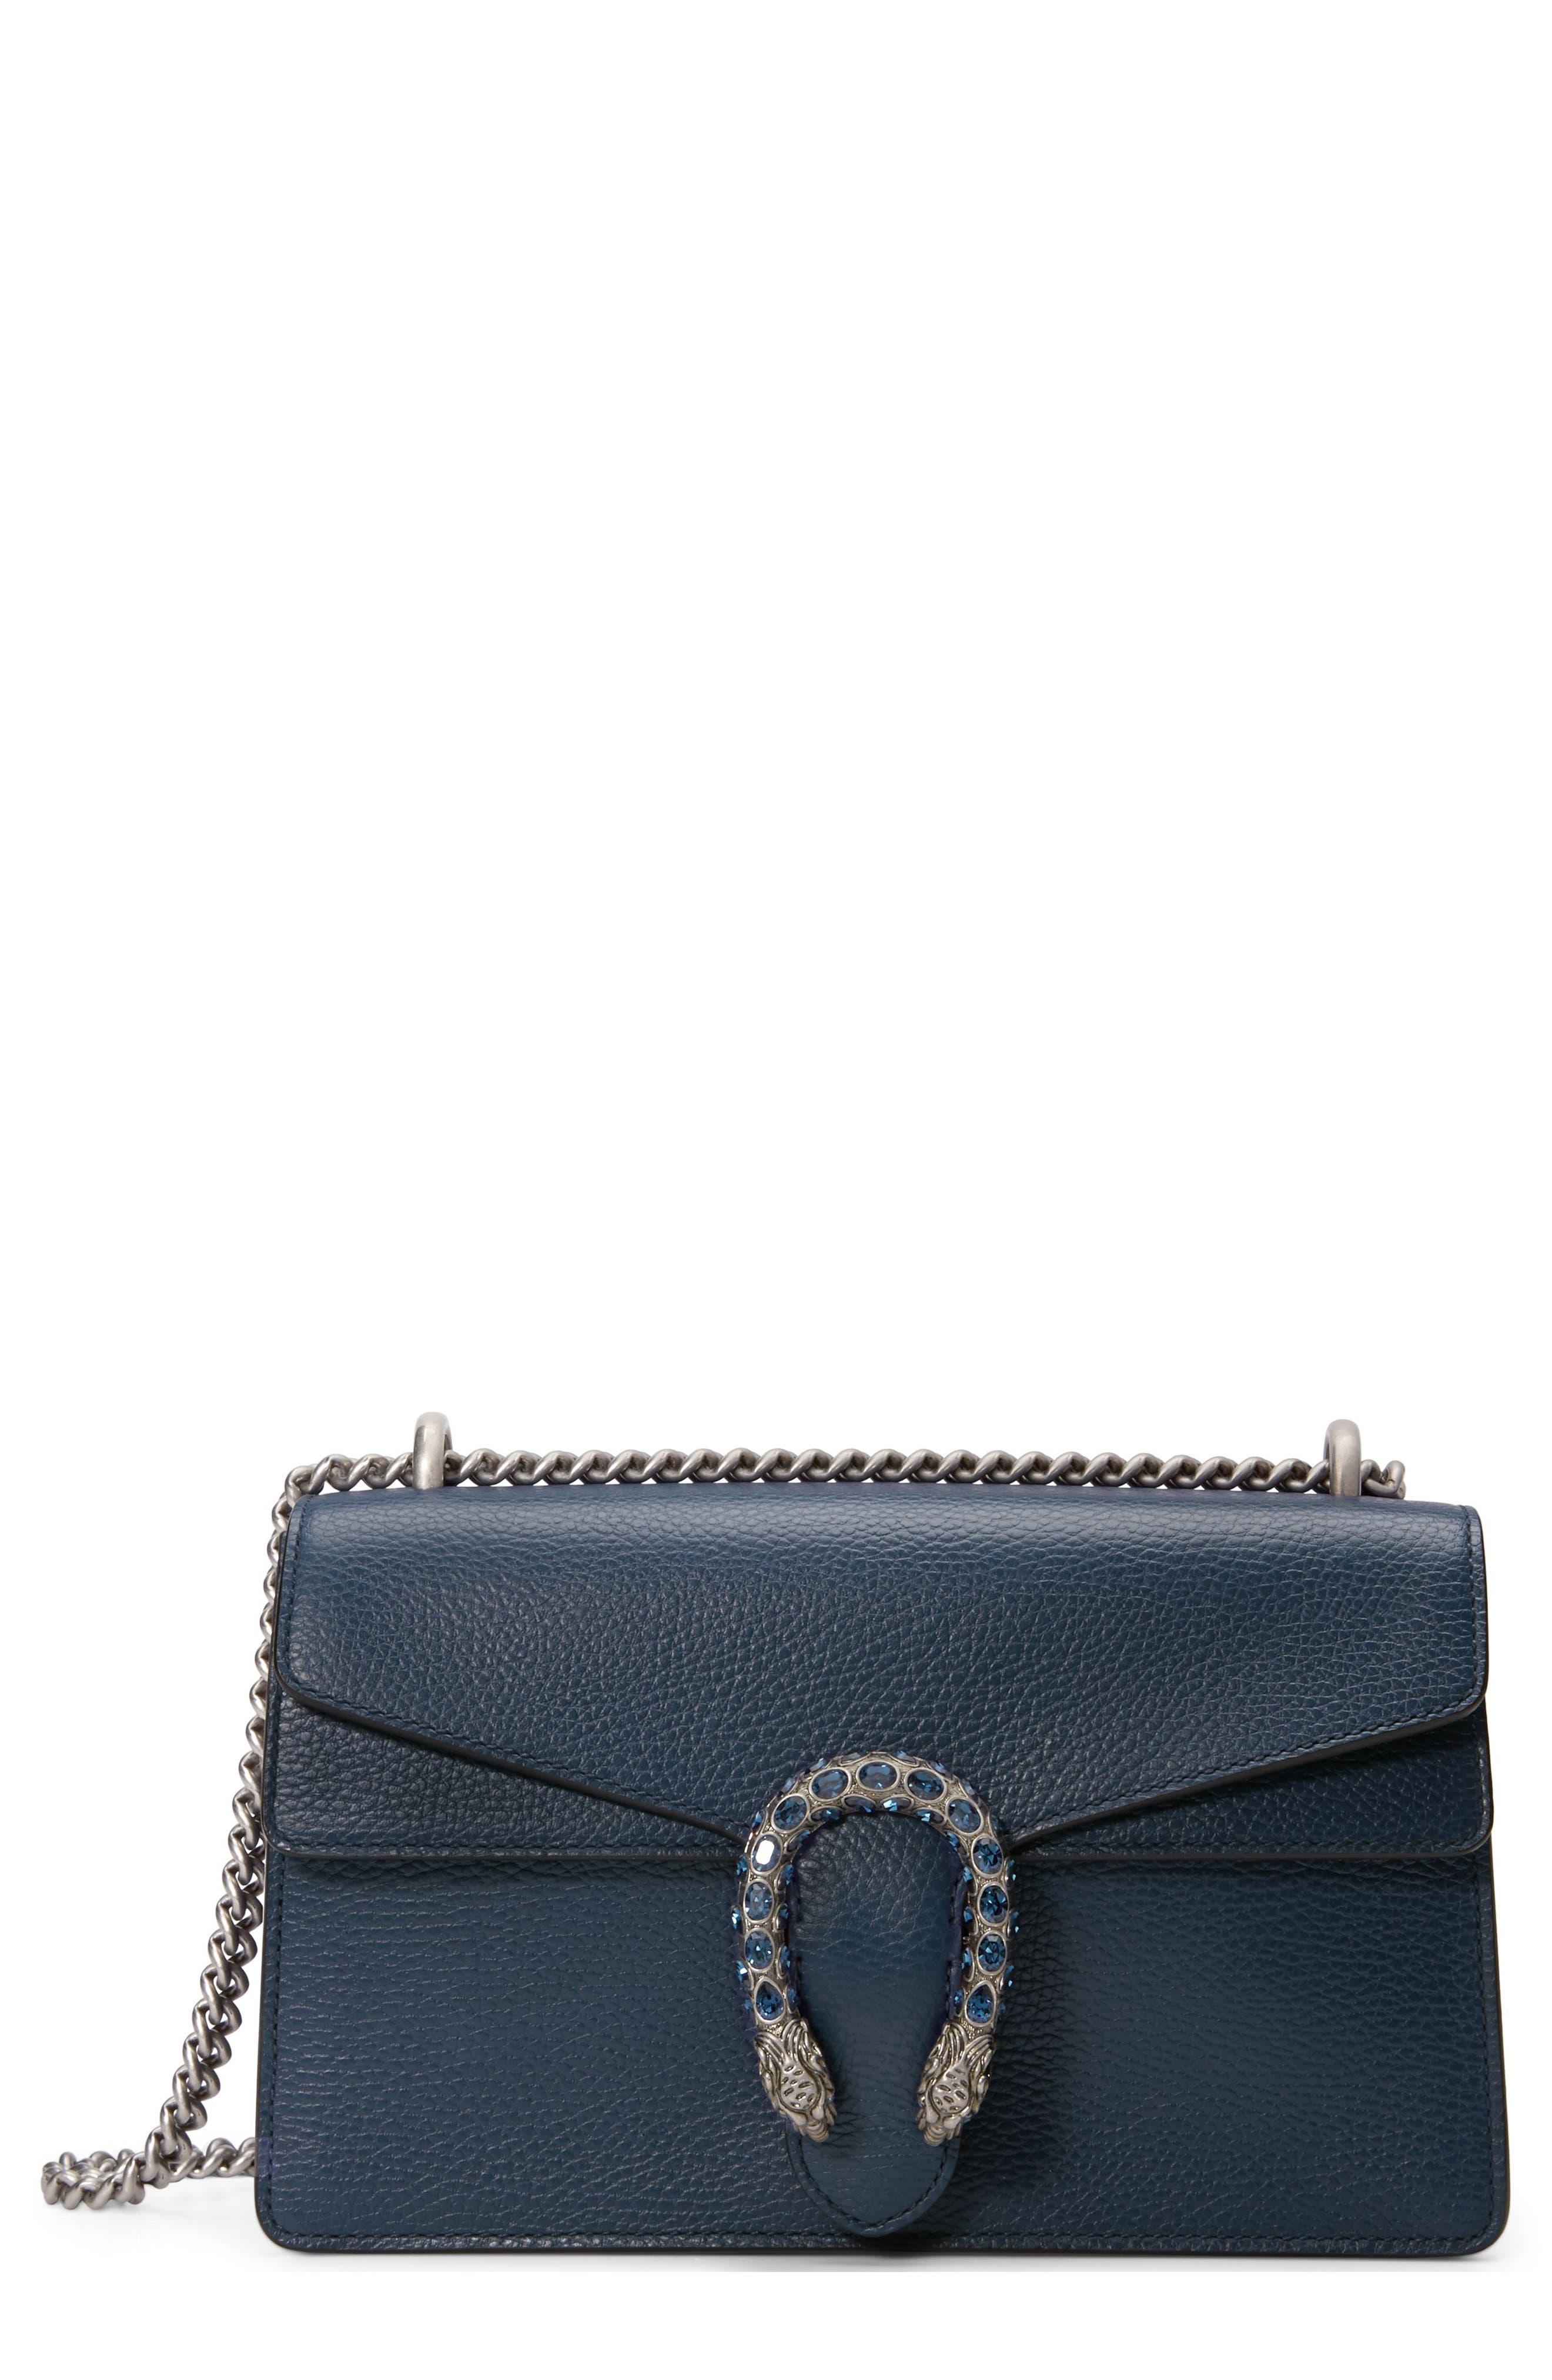 GUCCI Small Dionysus Leather Shoulder Bag, Main, color, BLU AGATA/ MONTANA